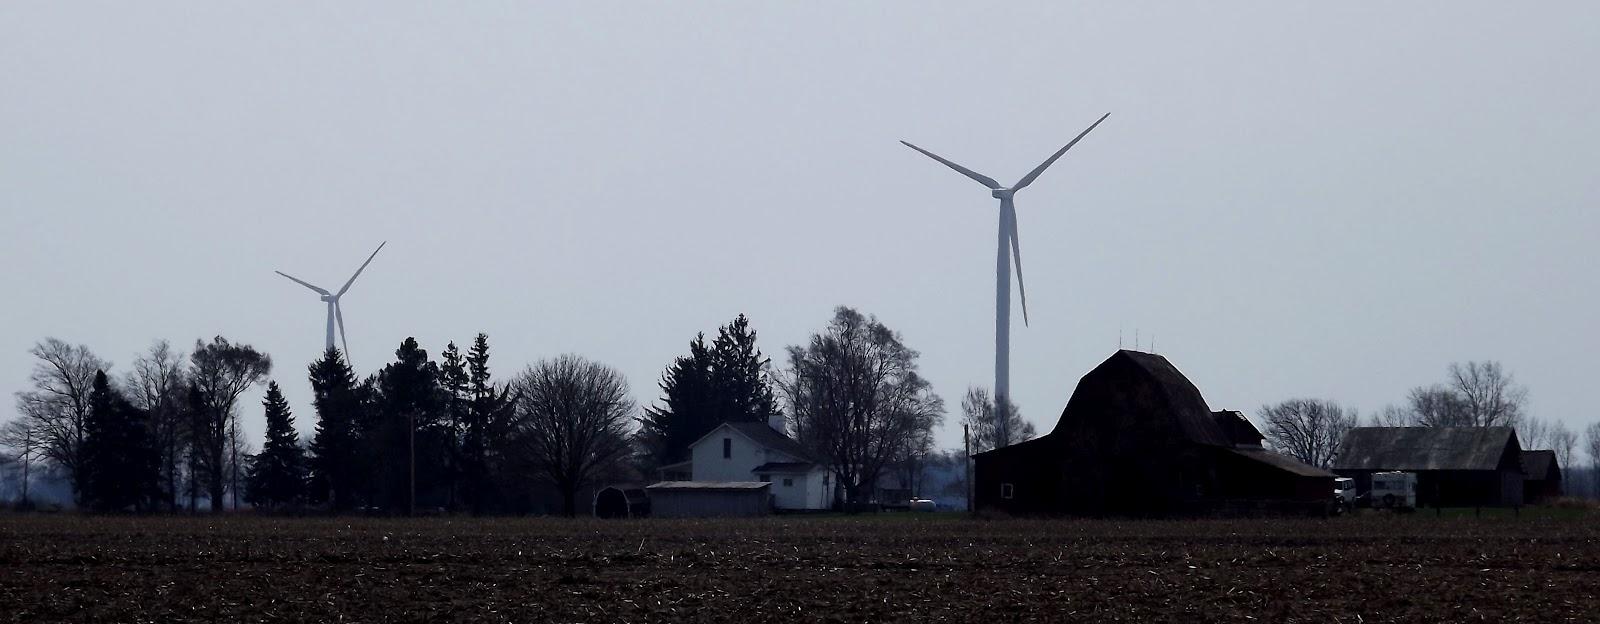 Mid Michigan Wind Farm near Ithaca